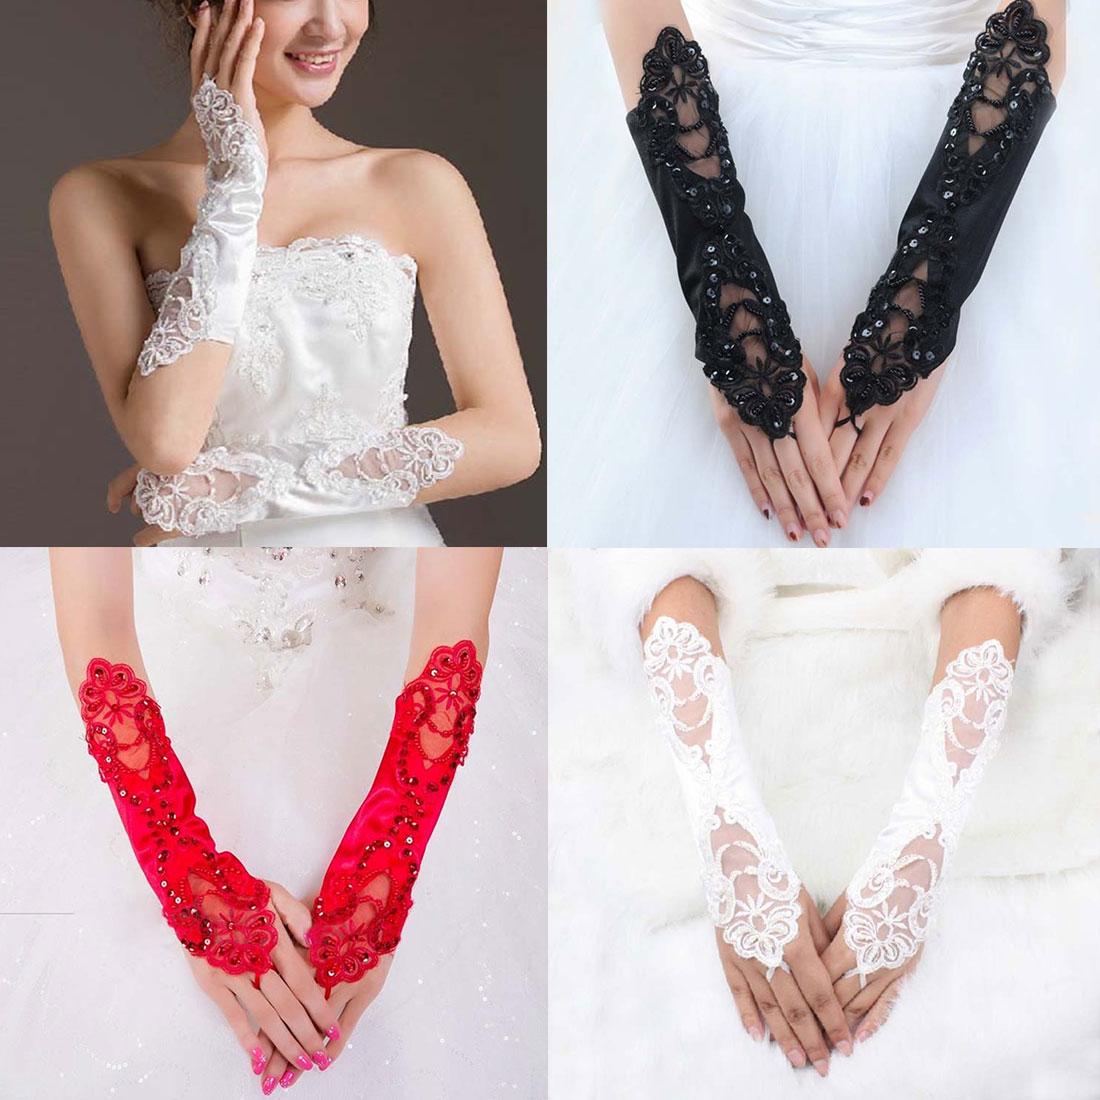 1 Pair Women Bride Long Lace Arm Elbow Gloves Fingerless Black Whites